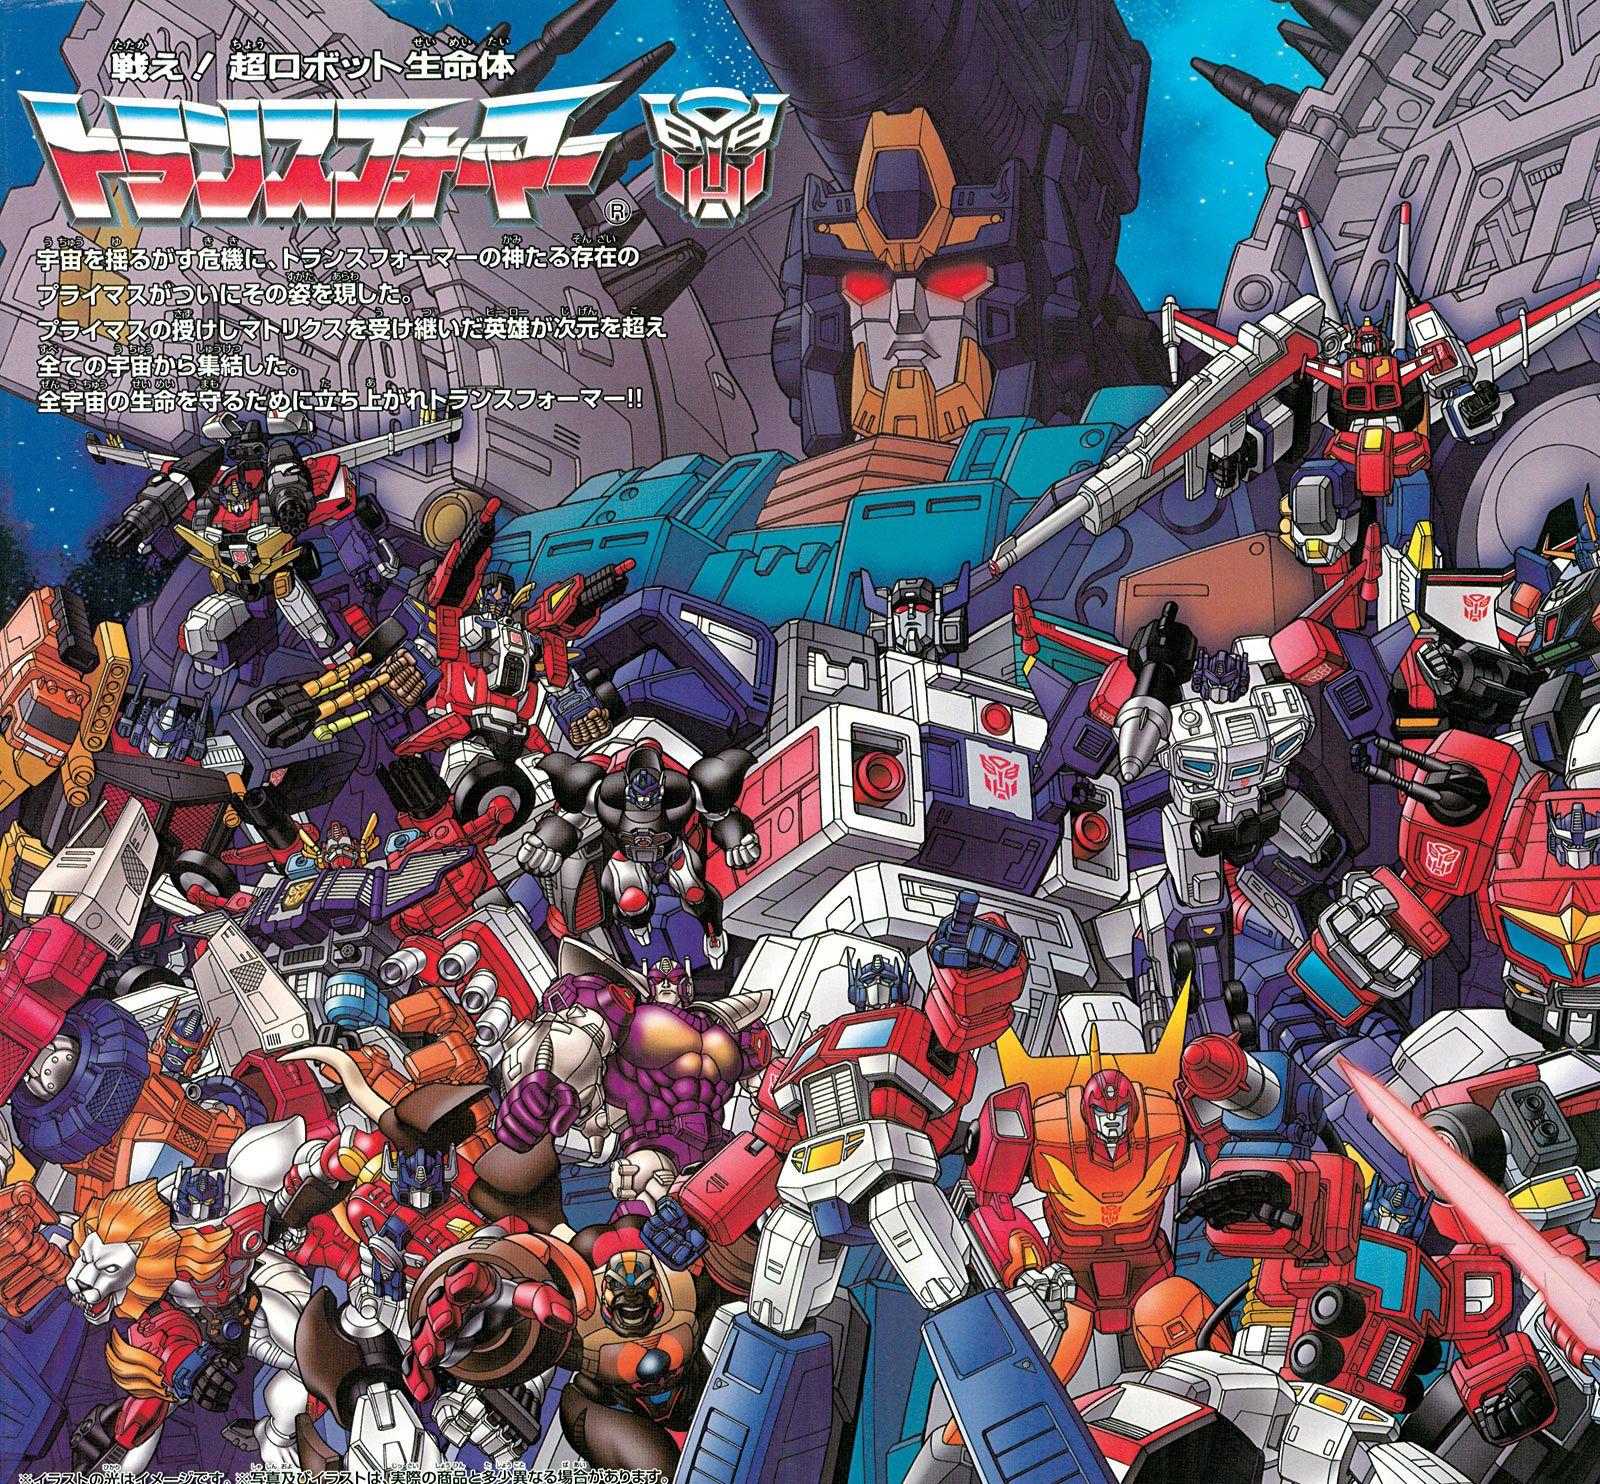 Transformers G1 Checklist Poster Vintage 1984 Hasbro Optimus Prime Megatron